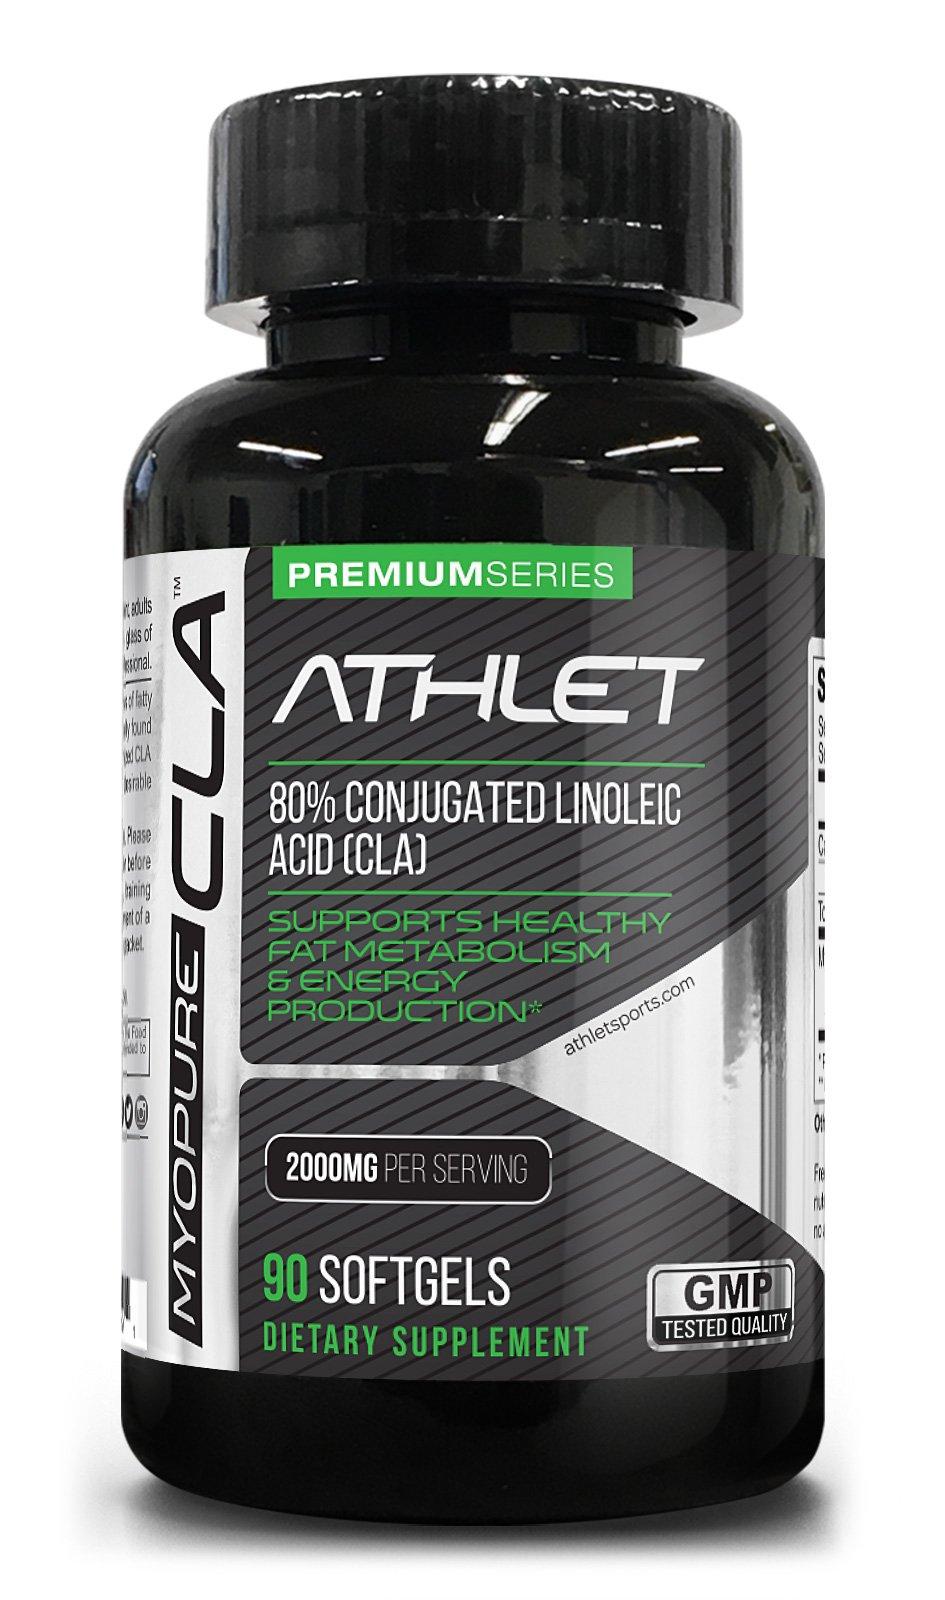 Myo-Pure CLA 2000 mg 90 Softgels   Weight Loss   Fat Burner   Lean Muscle   Energy   Endurance   Recovery   Conjugated Linoleic Acid